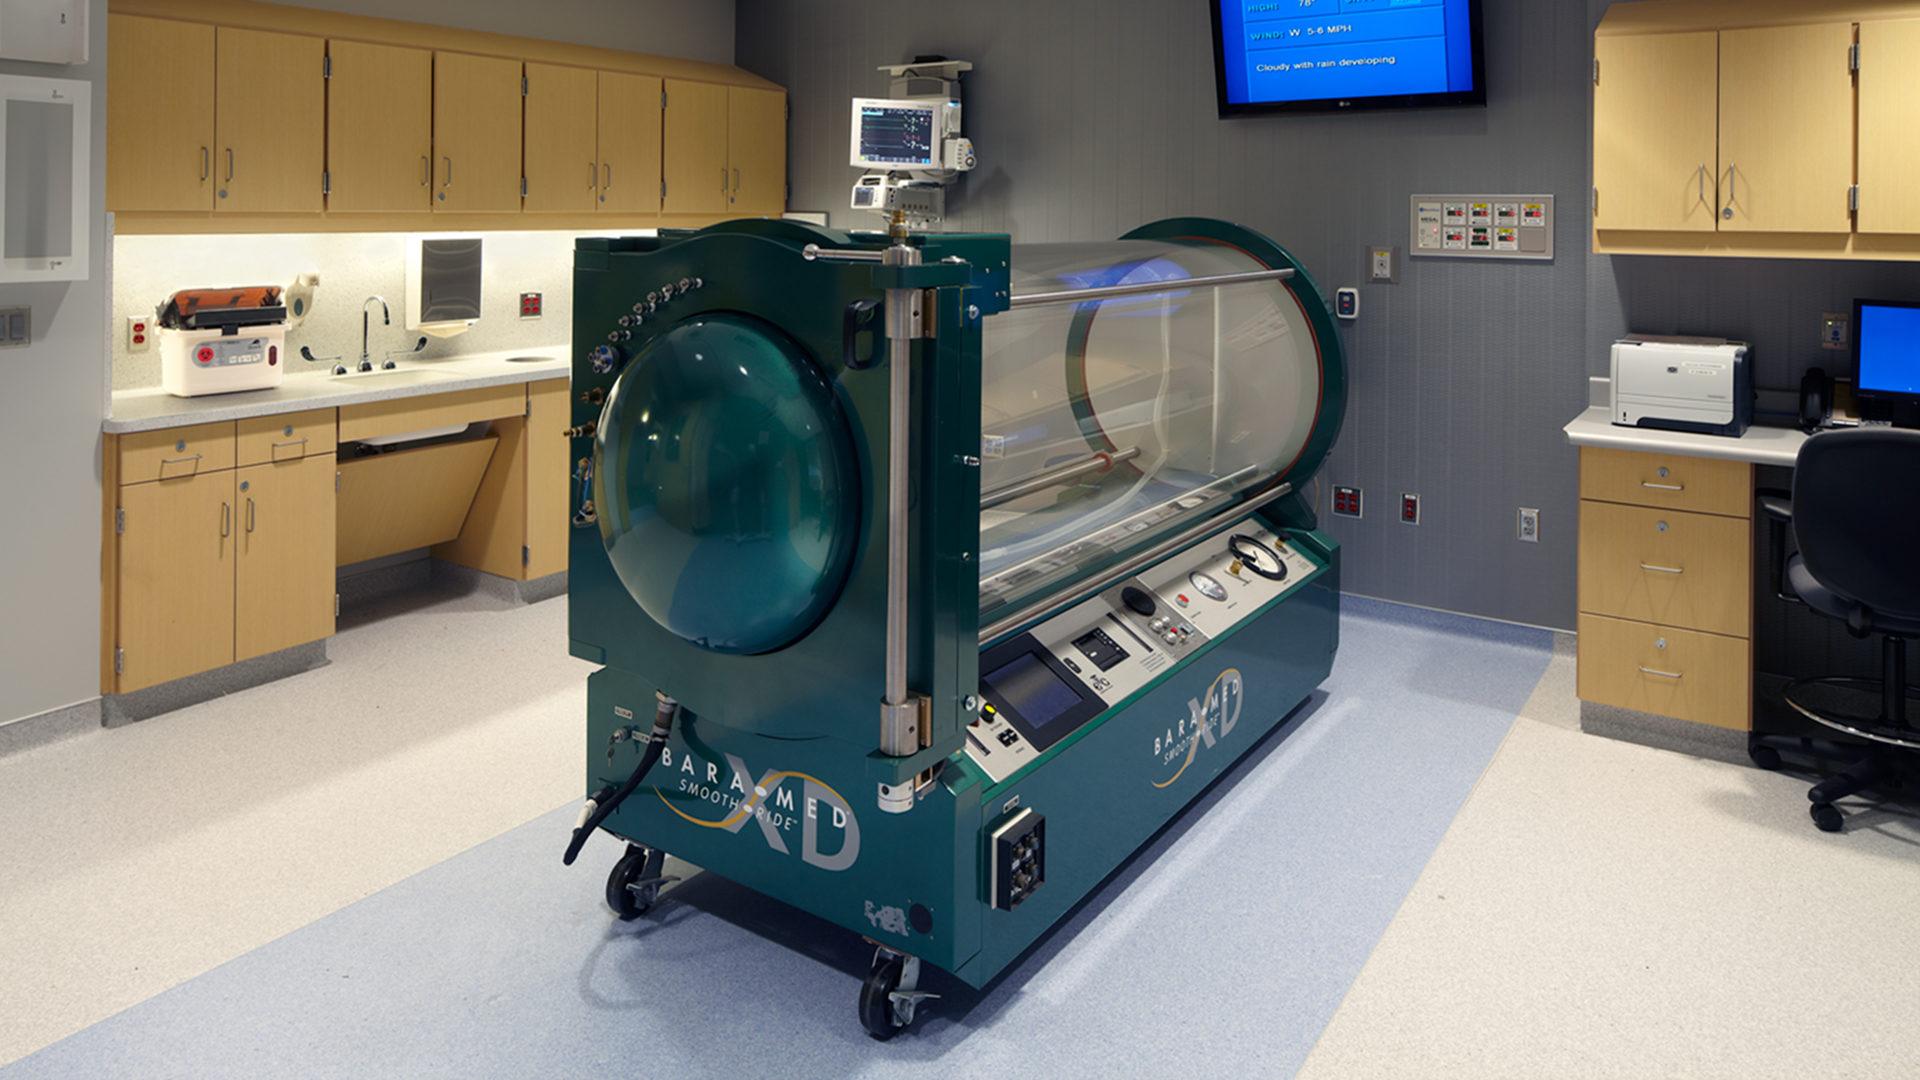 HCMC Hyperbaric Chamber Interior Lab Room Hosting a Bara Med Smooth Ride Machine